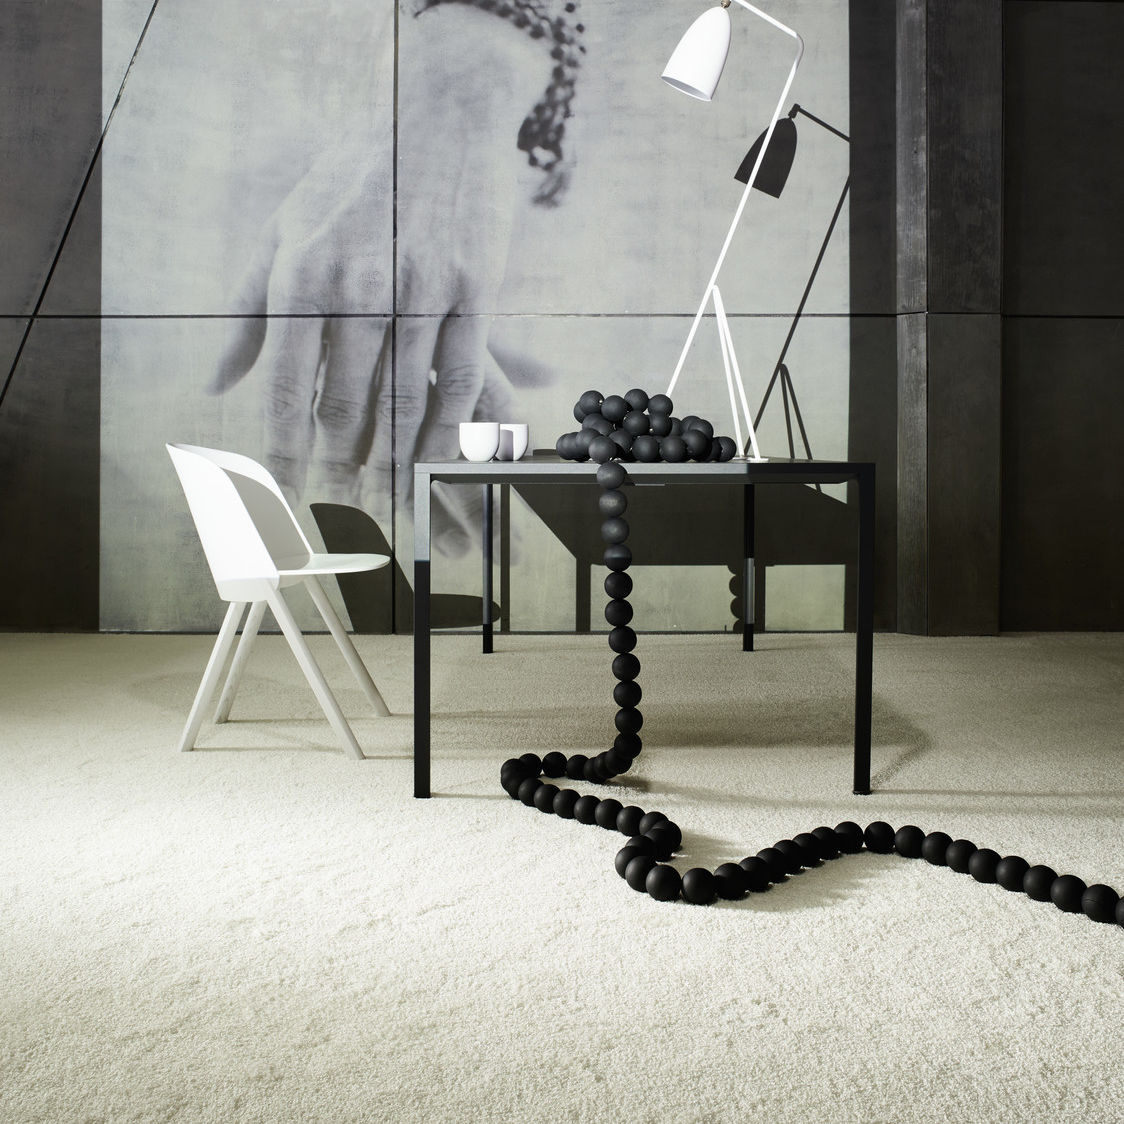 Carpet Tile Smoozy 1600 Tile Object Carpet Tufted Shag Polyamide